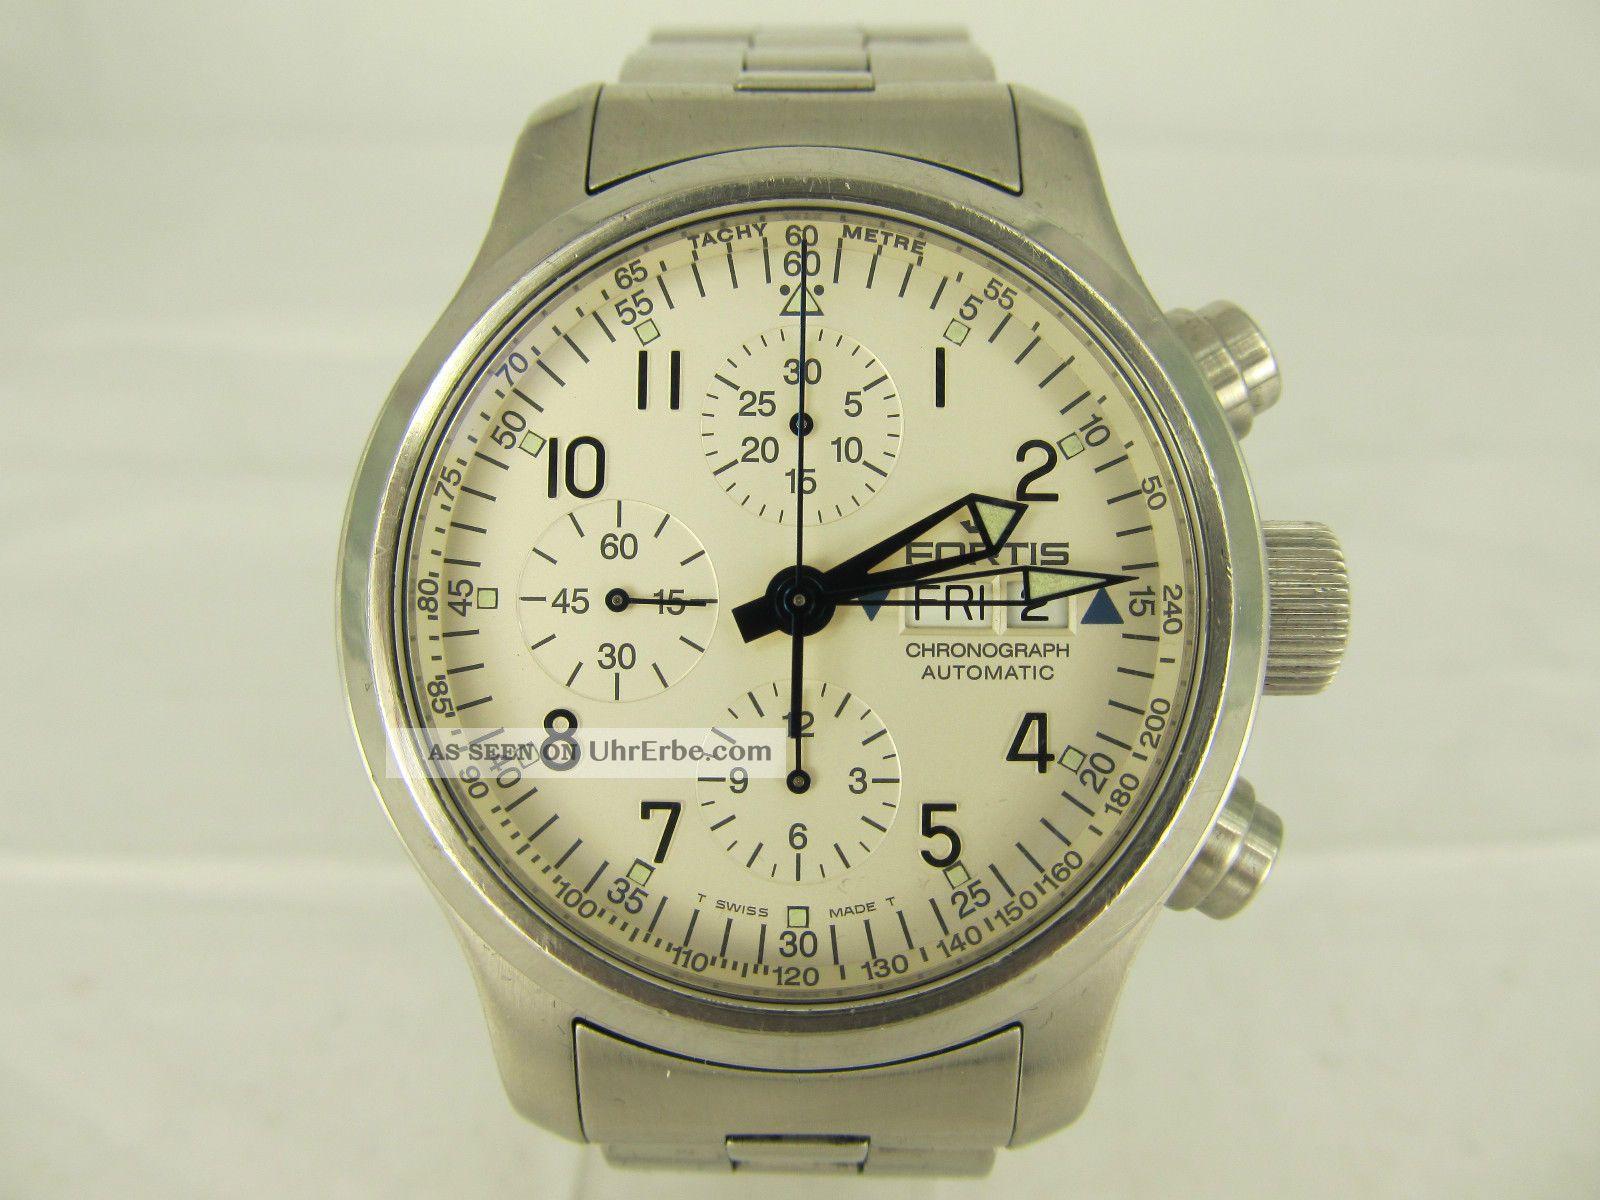 Fortis B - 42 Chronograph Automatic Stahl Herrenuhr Mit Stahlband Armbanduhren Bild